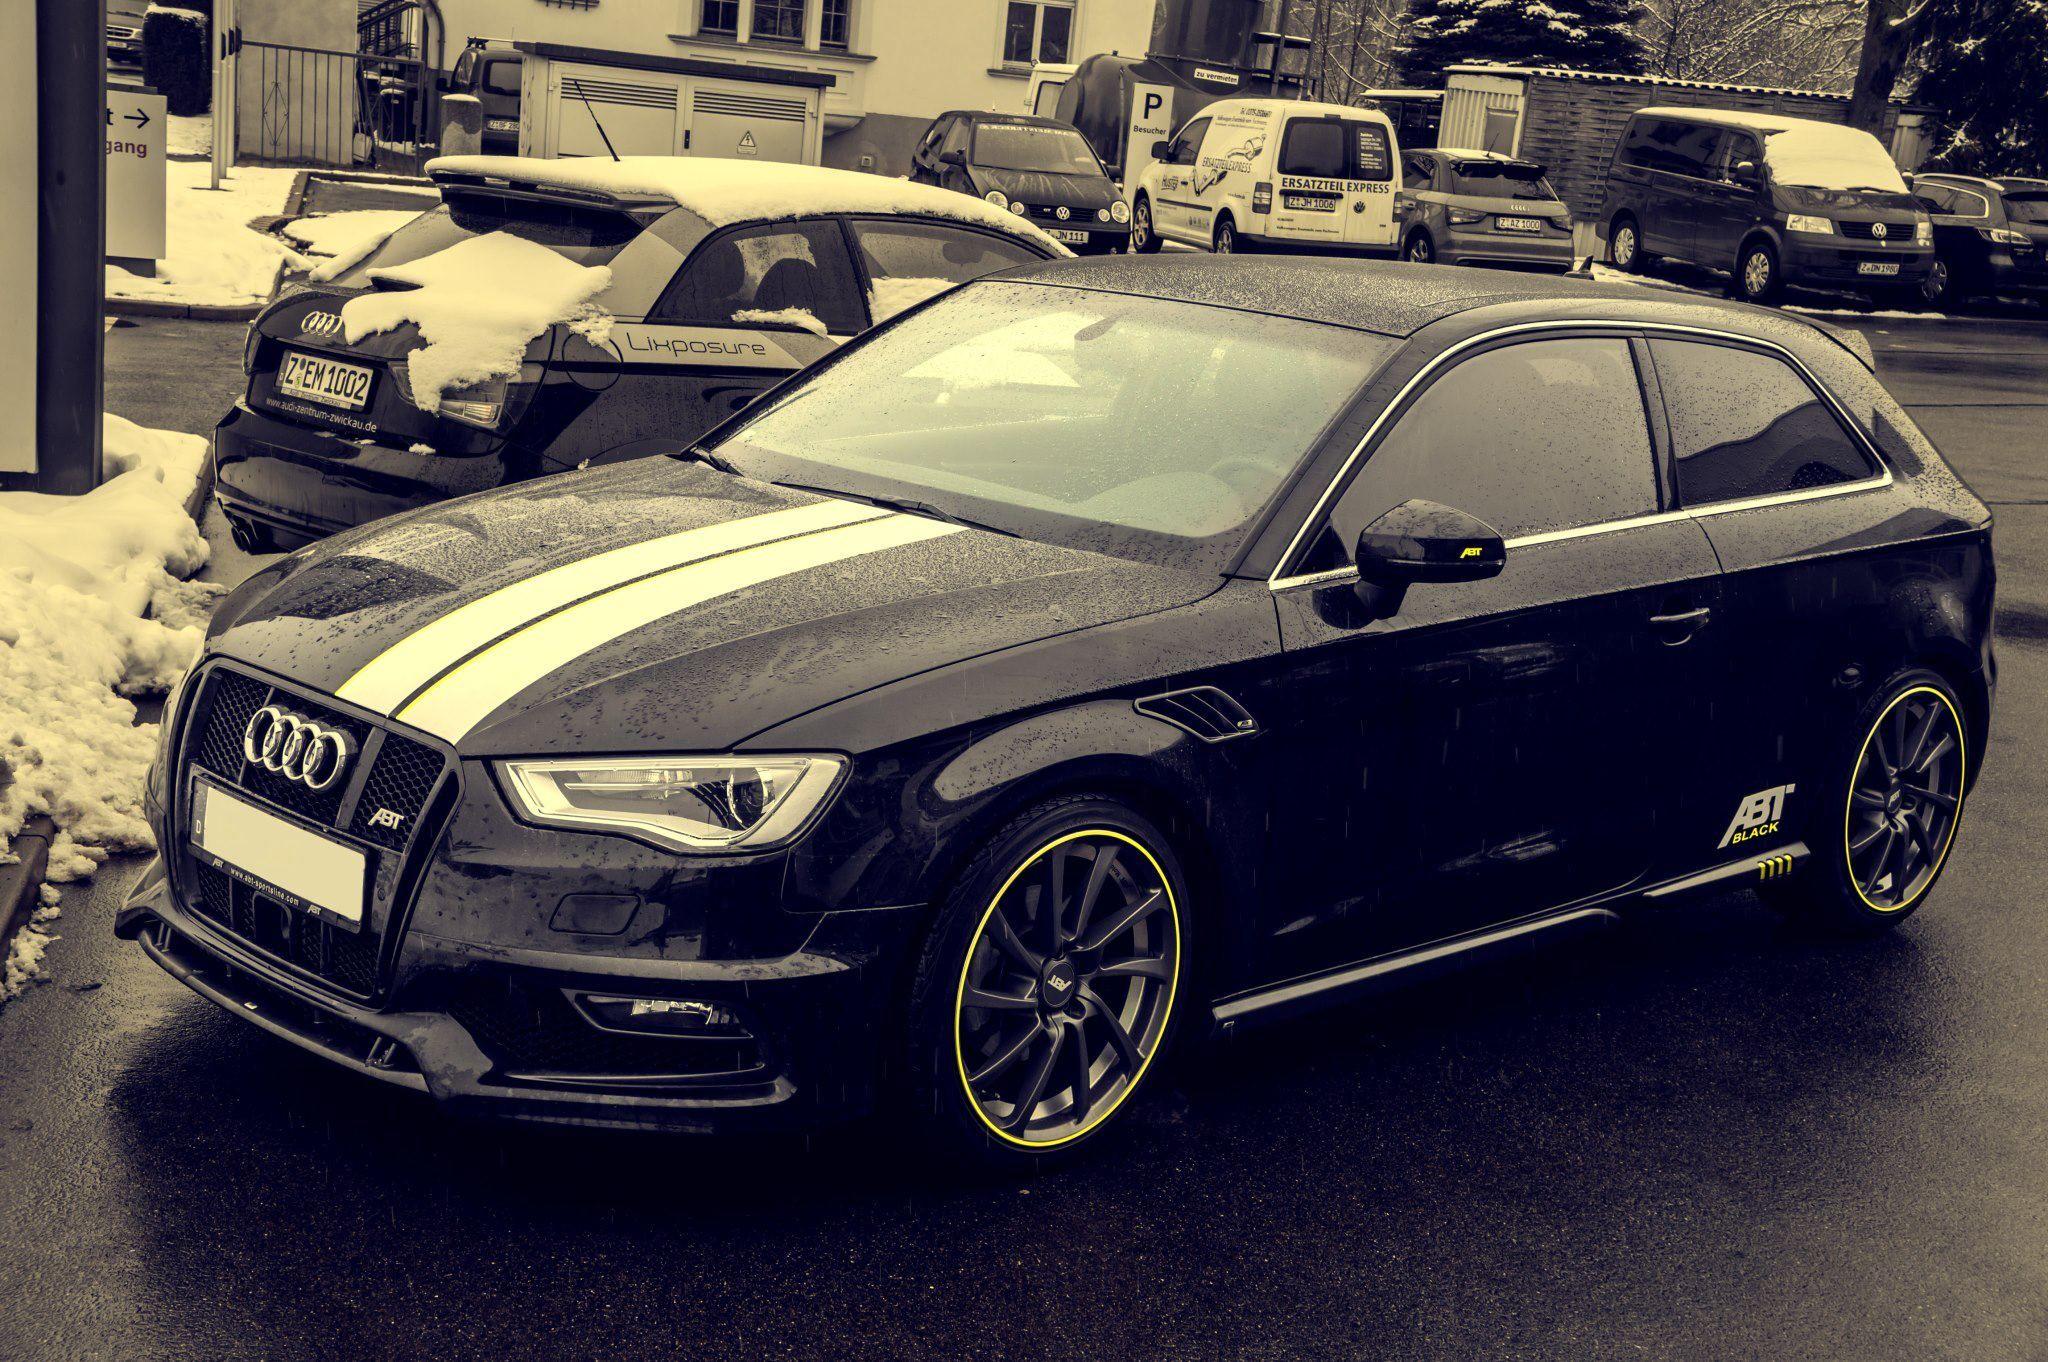 Audi AS3 by ABT Sportsline GmbH Cars Pinterest